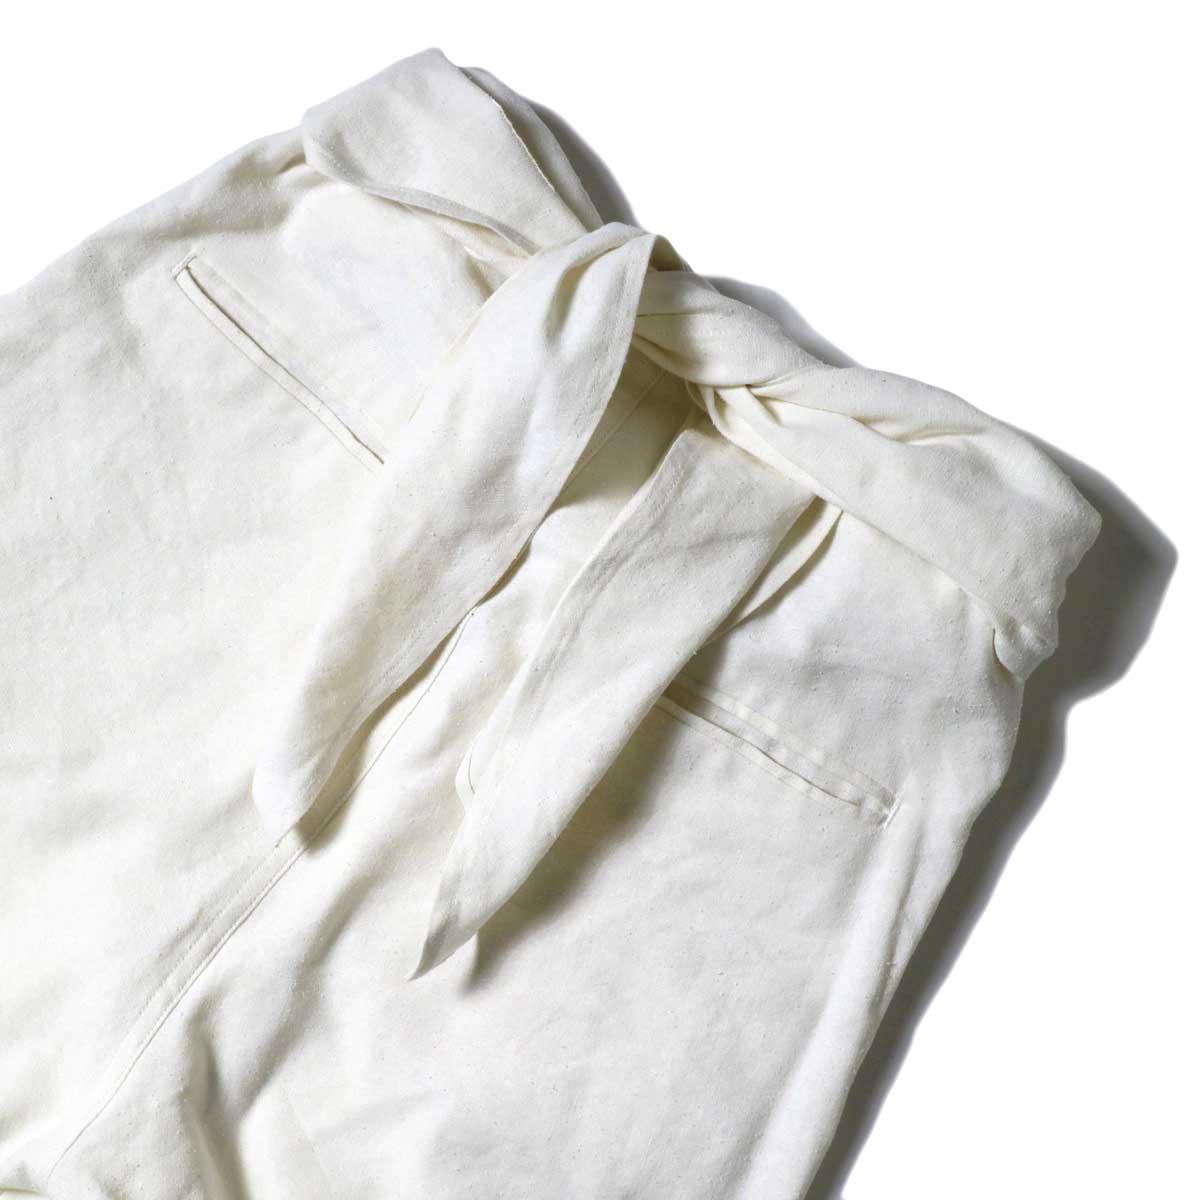 ARCHI / S/L NEP WRAP SLACKS (White) ウエスト背面①